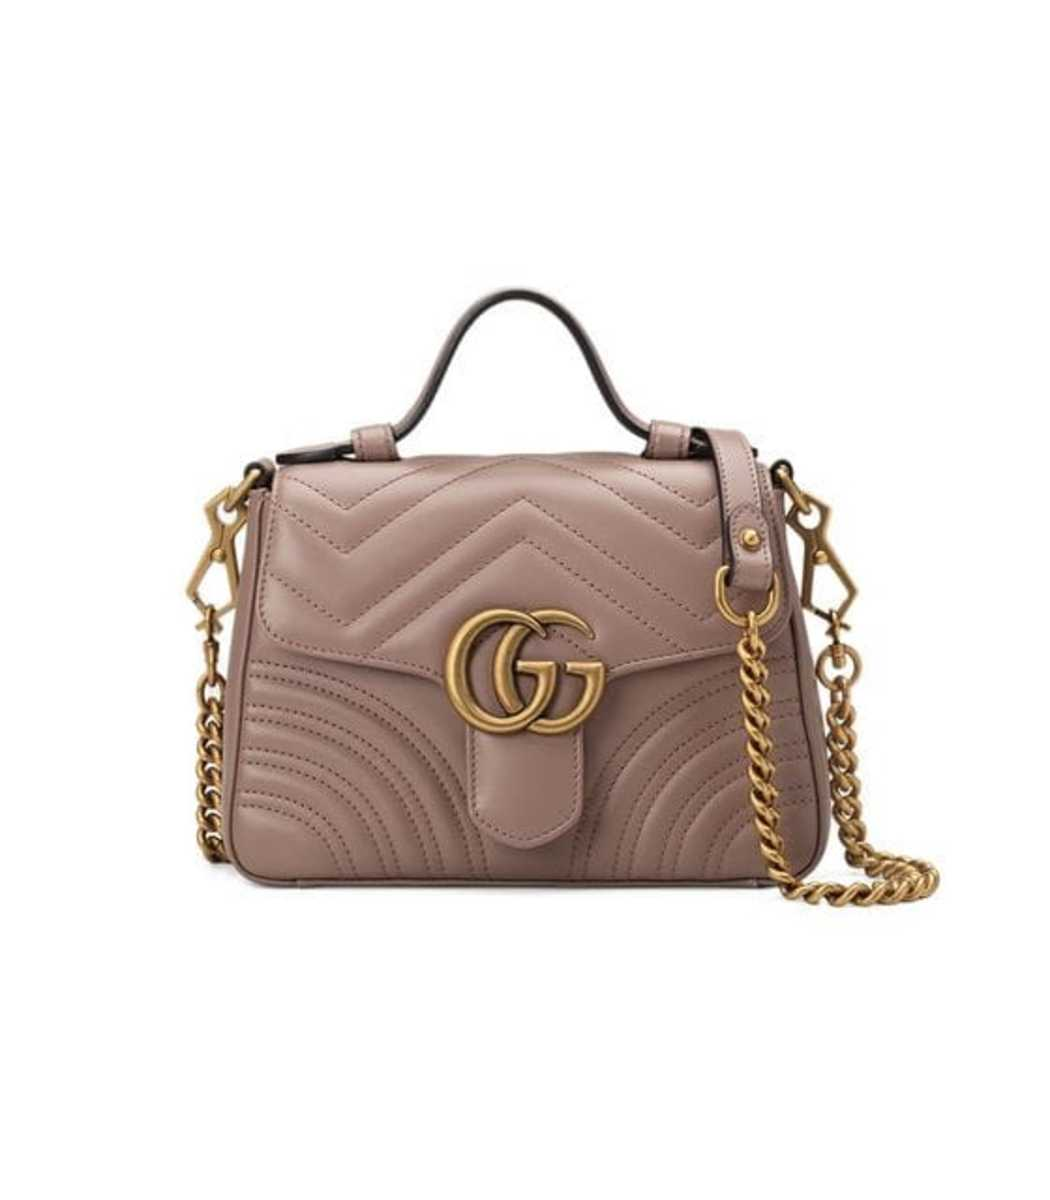 571bc7184c0 Gucci Gg Marmont Mini Chevron Leather Satchel Bag In Brown ...